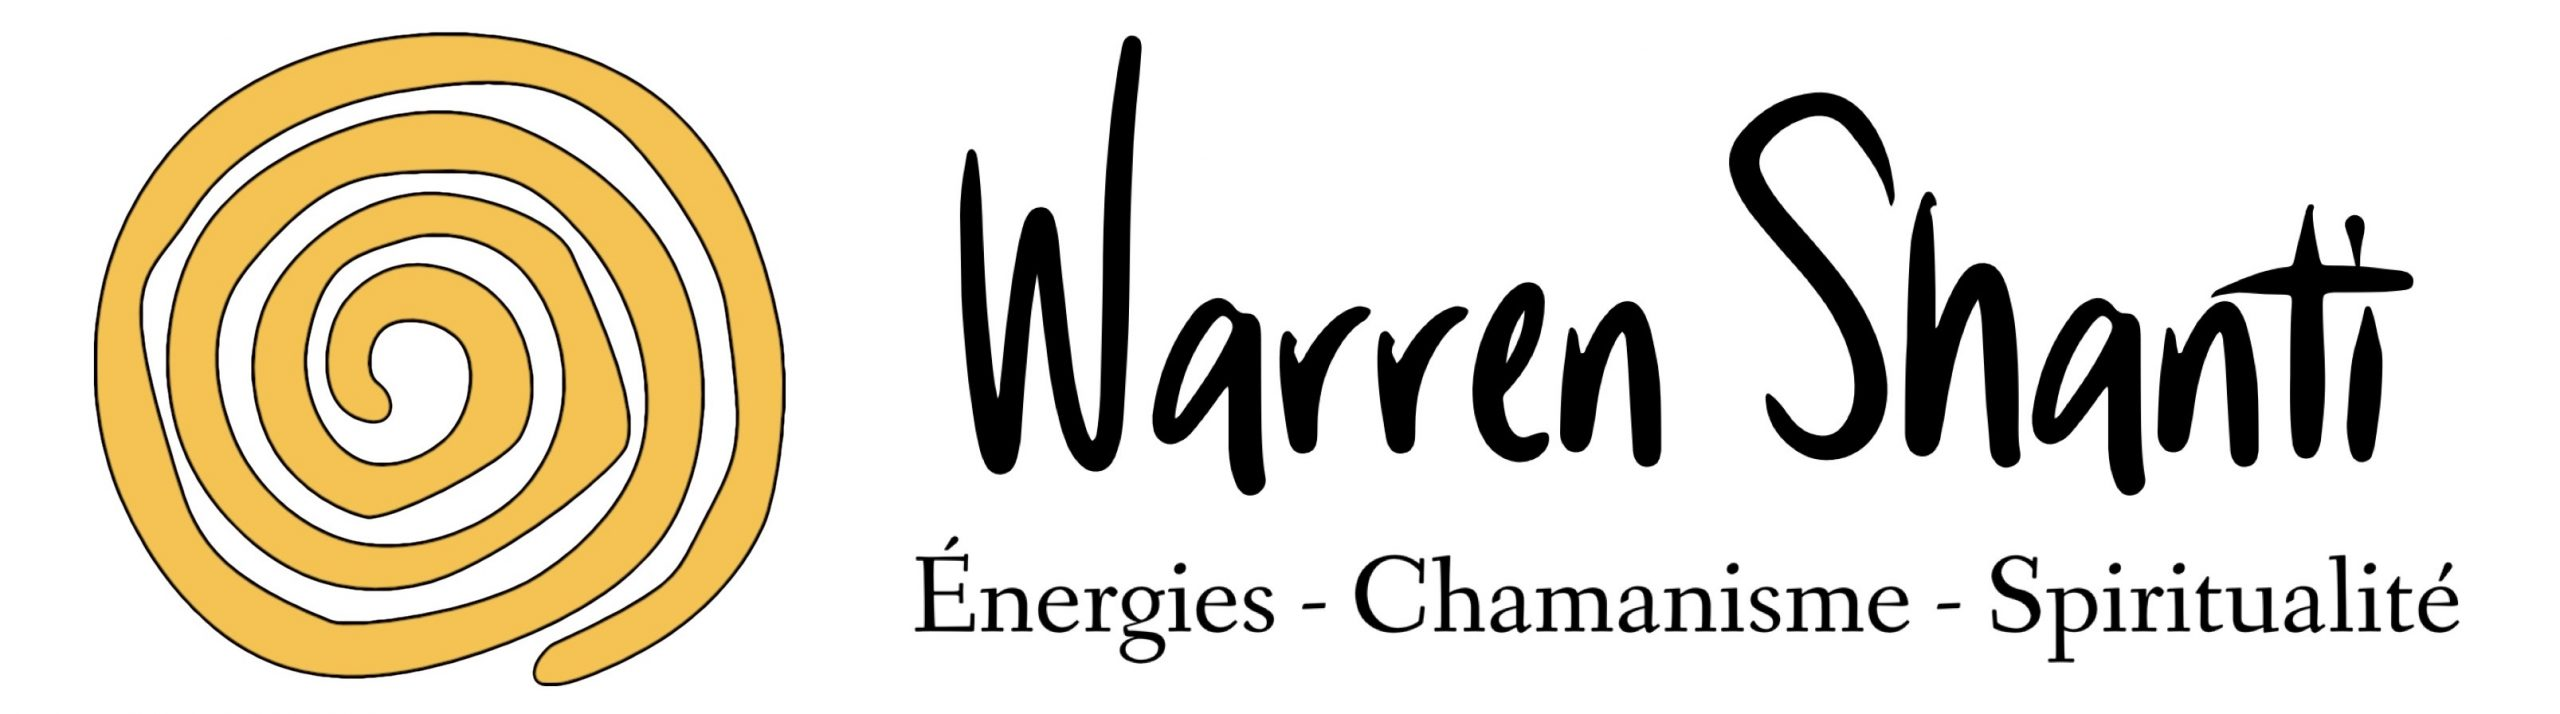 Warren Shanti - Guérisseur Corps Âme Esprit